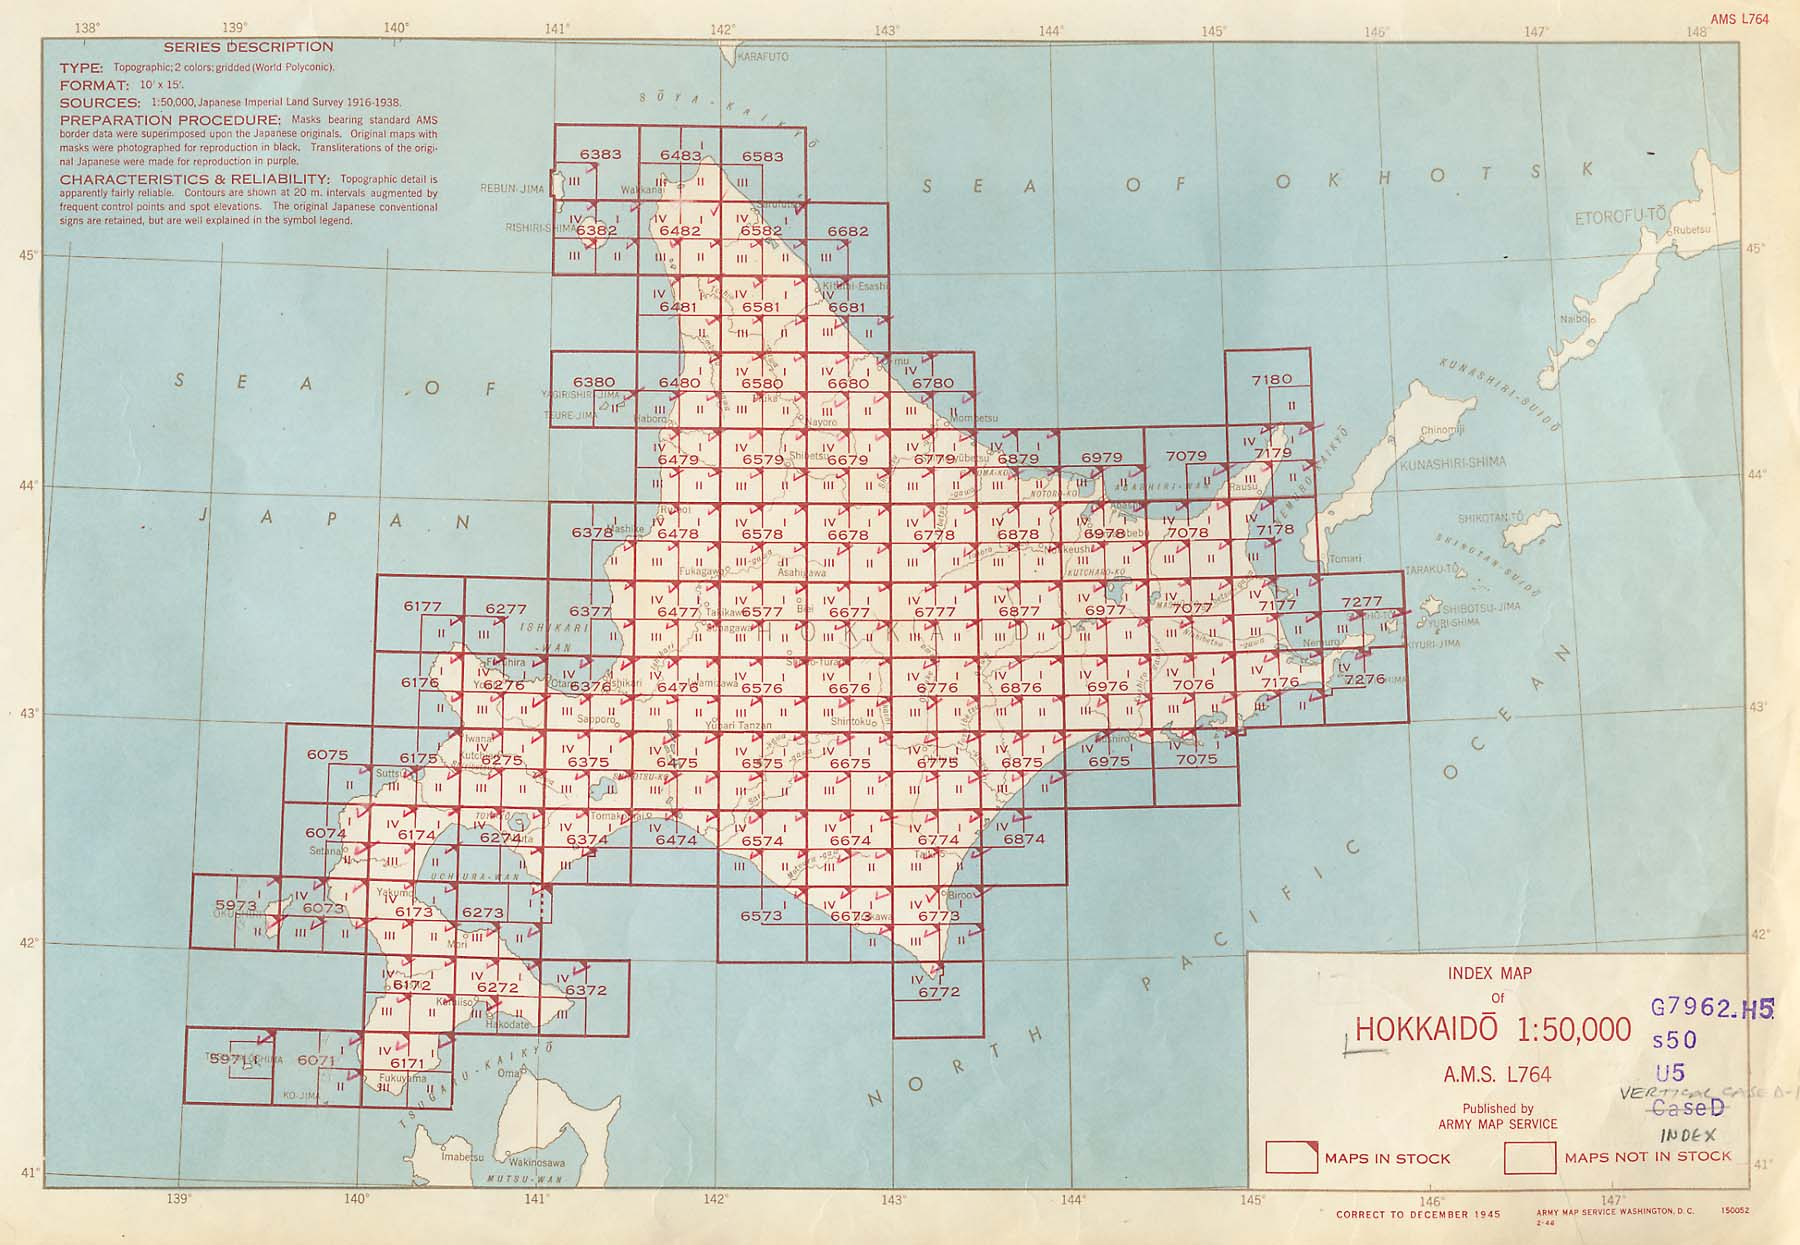 Hokkaido 1 50 000 Ams Series L764 Index Map U S Army Map Service